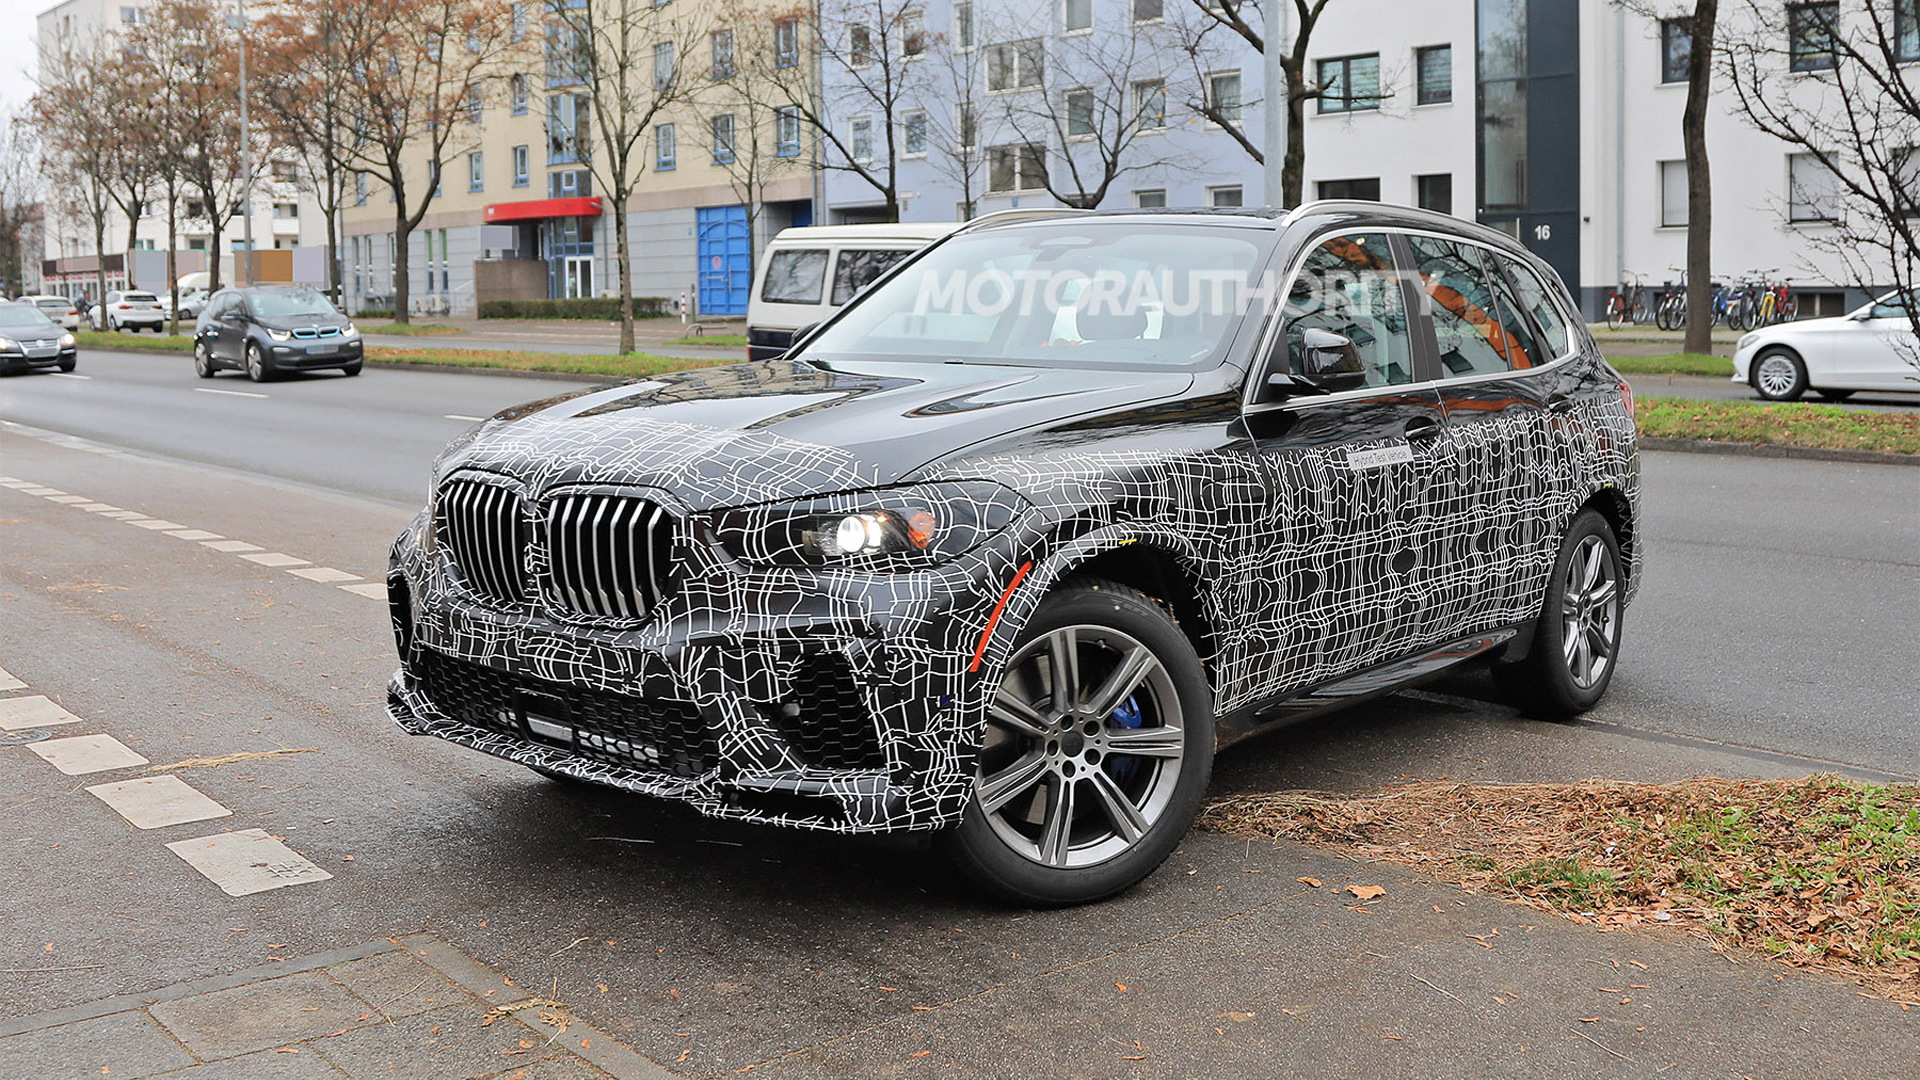 2023 BMW X5 facelift spy shots - Photo credit: S. Baldauf/SB-Medien